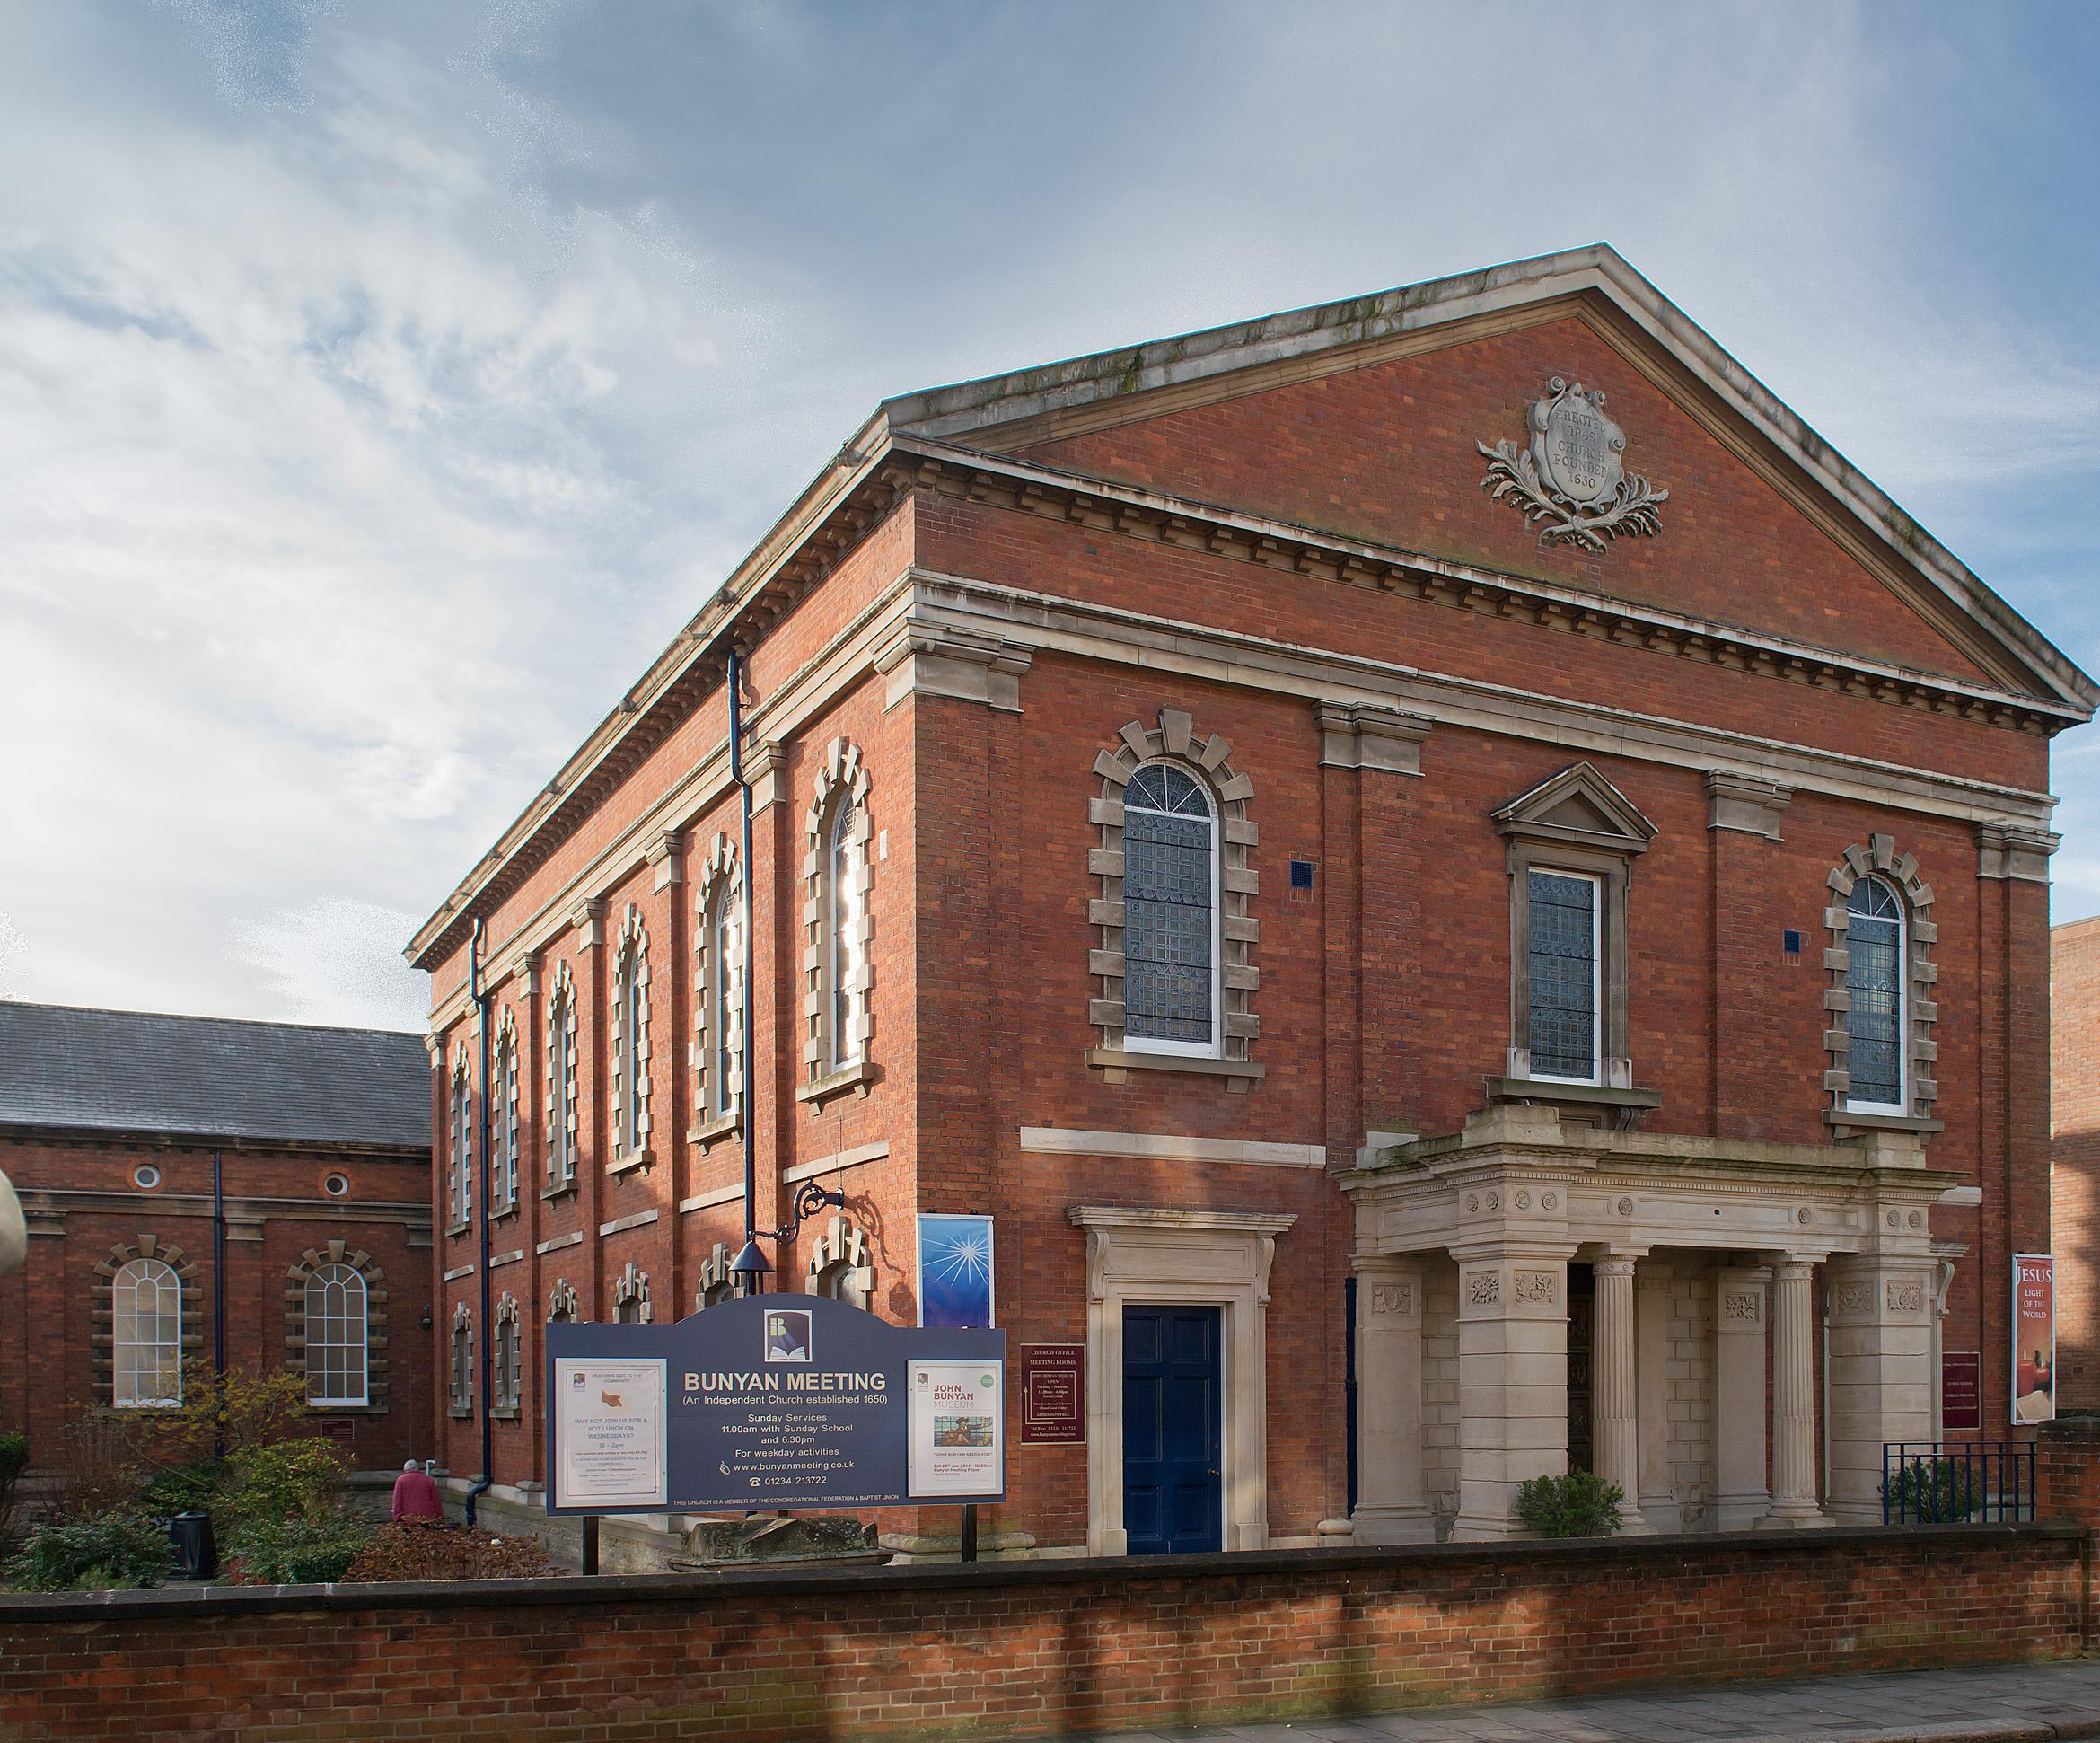 Bunyan Meeting Church